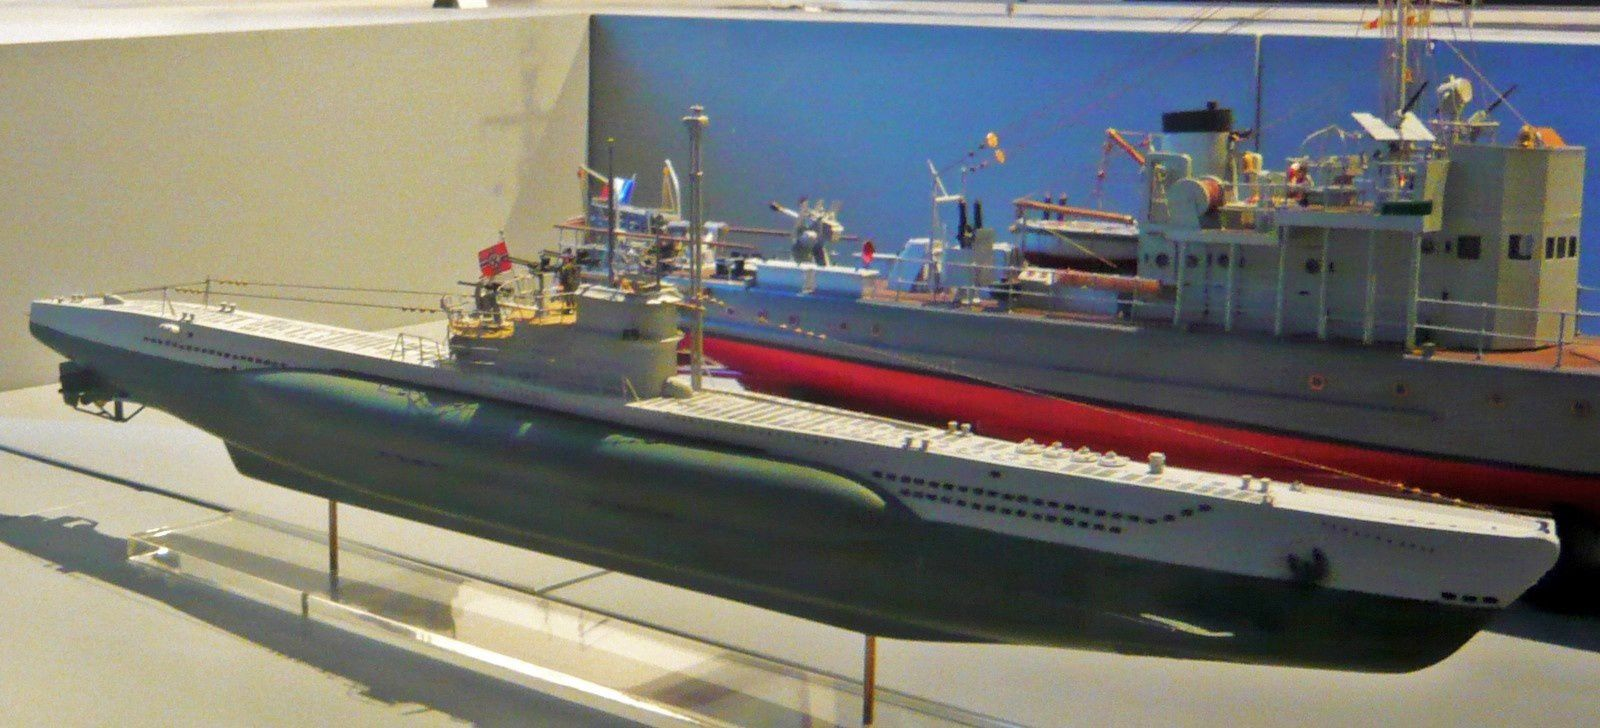 Sous-marin U-995, musée de la Marine